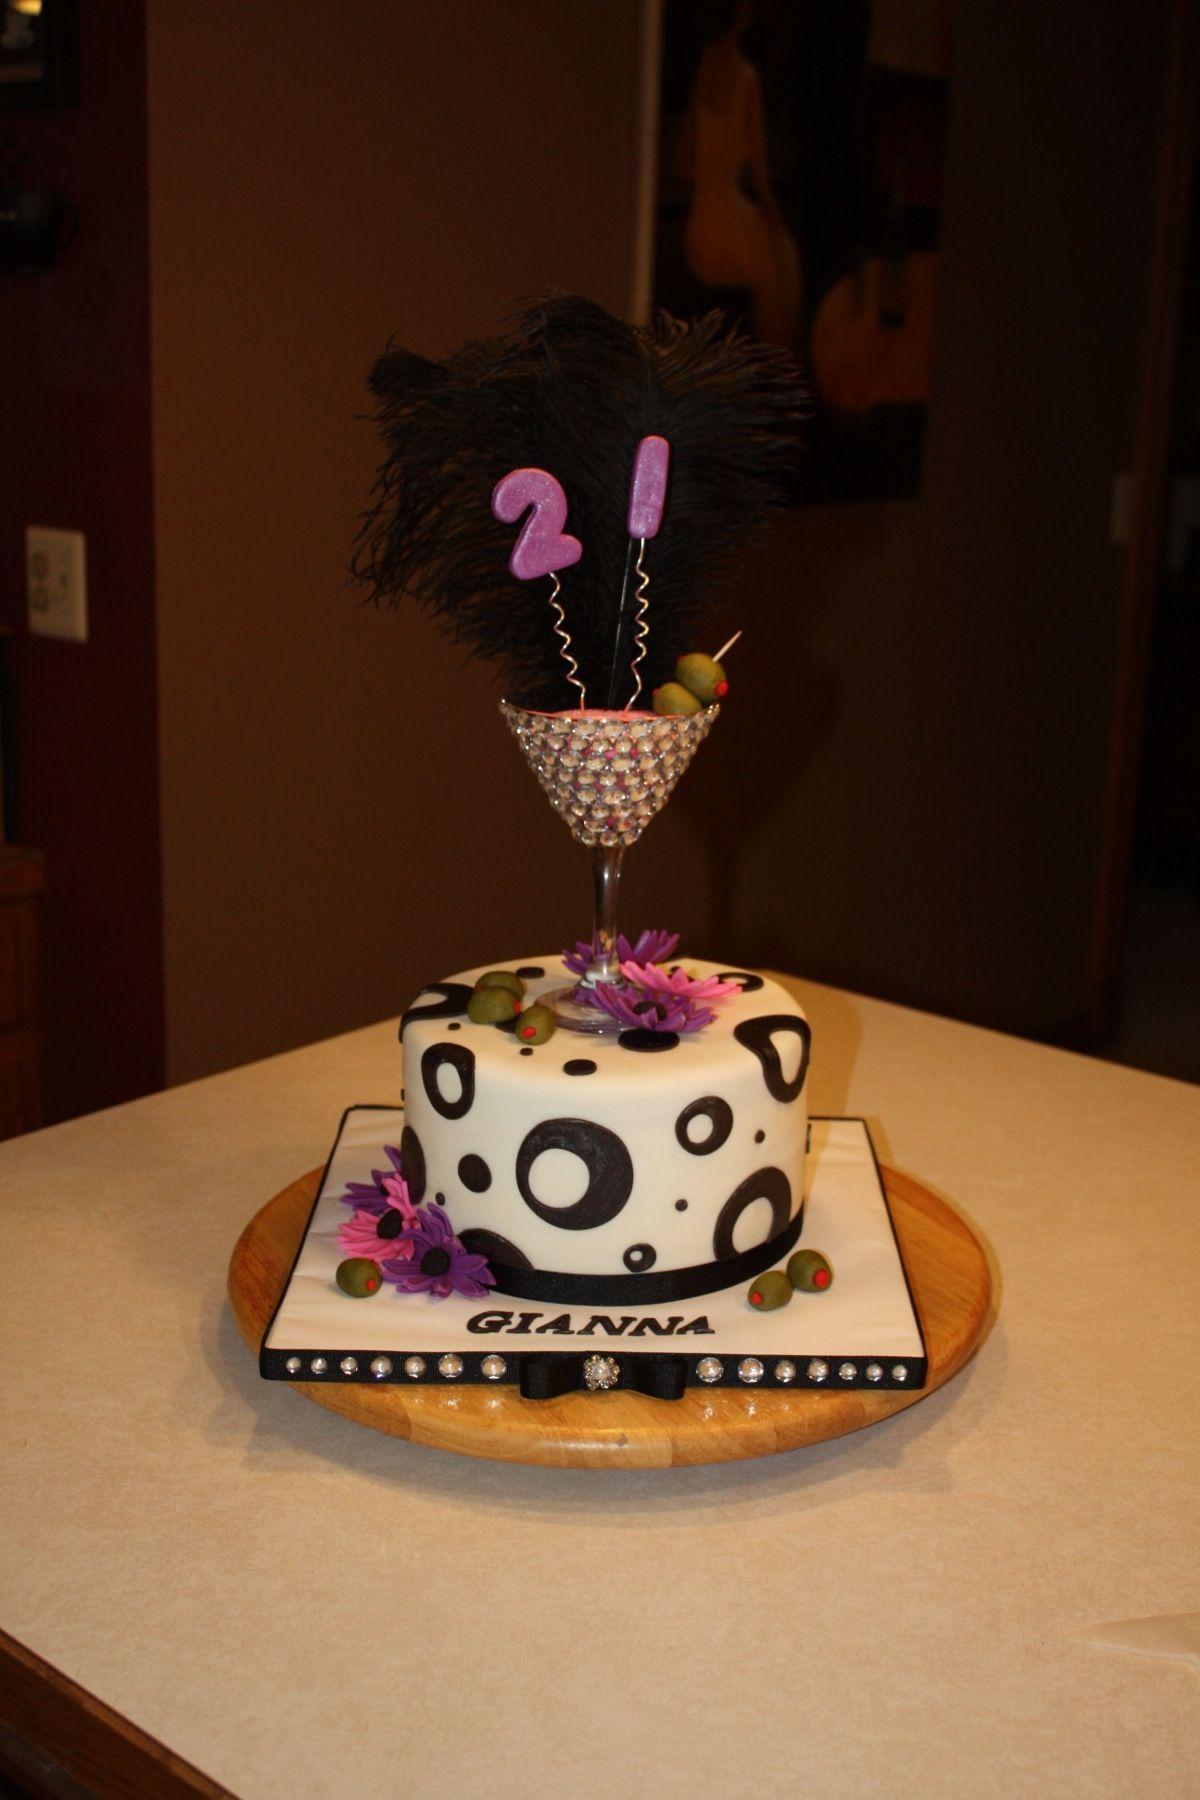 Birthday Cake Designs For 21st Birthday : Pinterest